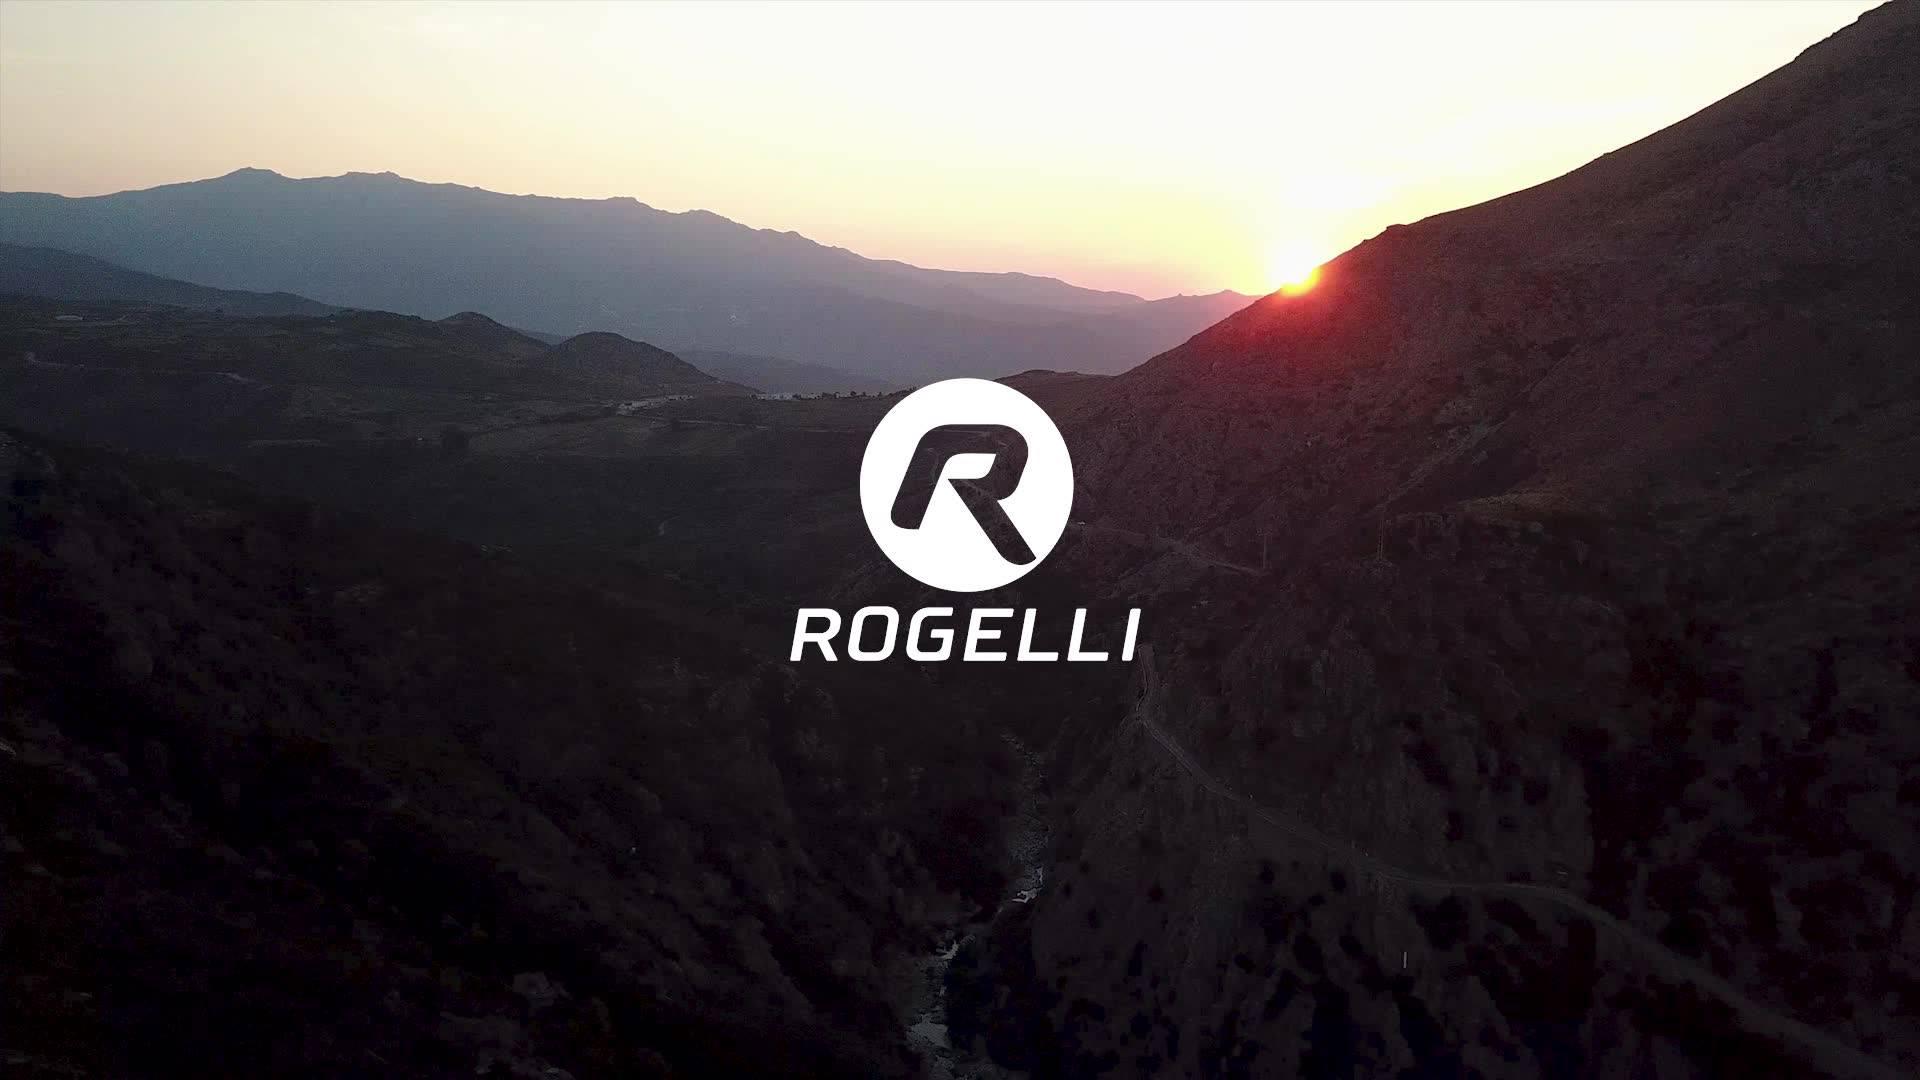 rogelli baner z logo